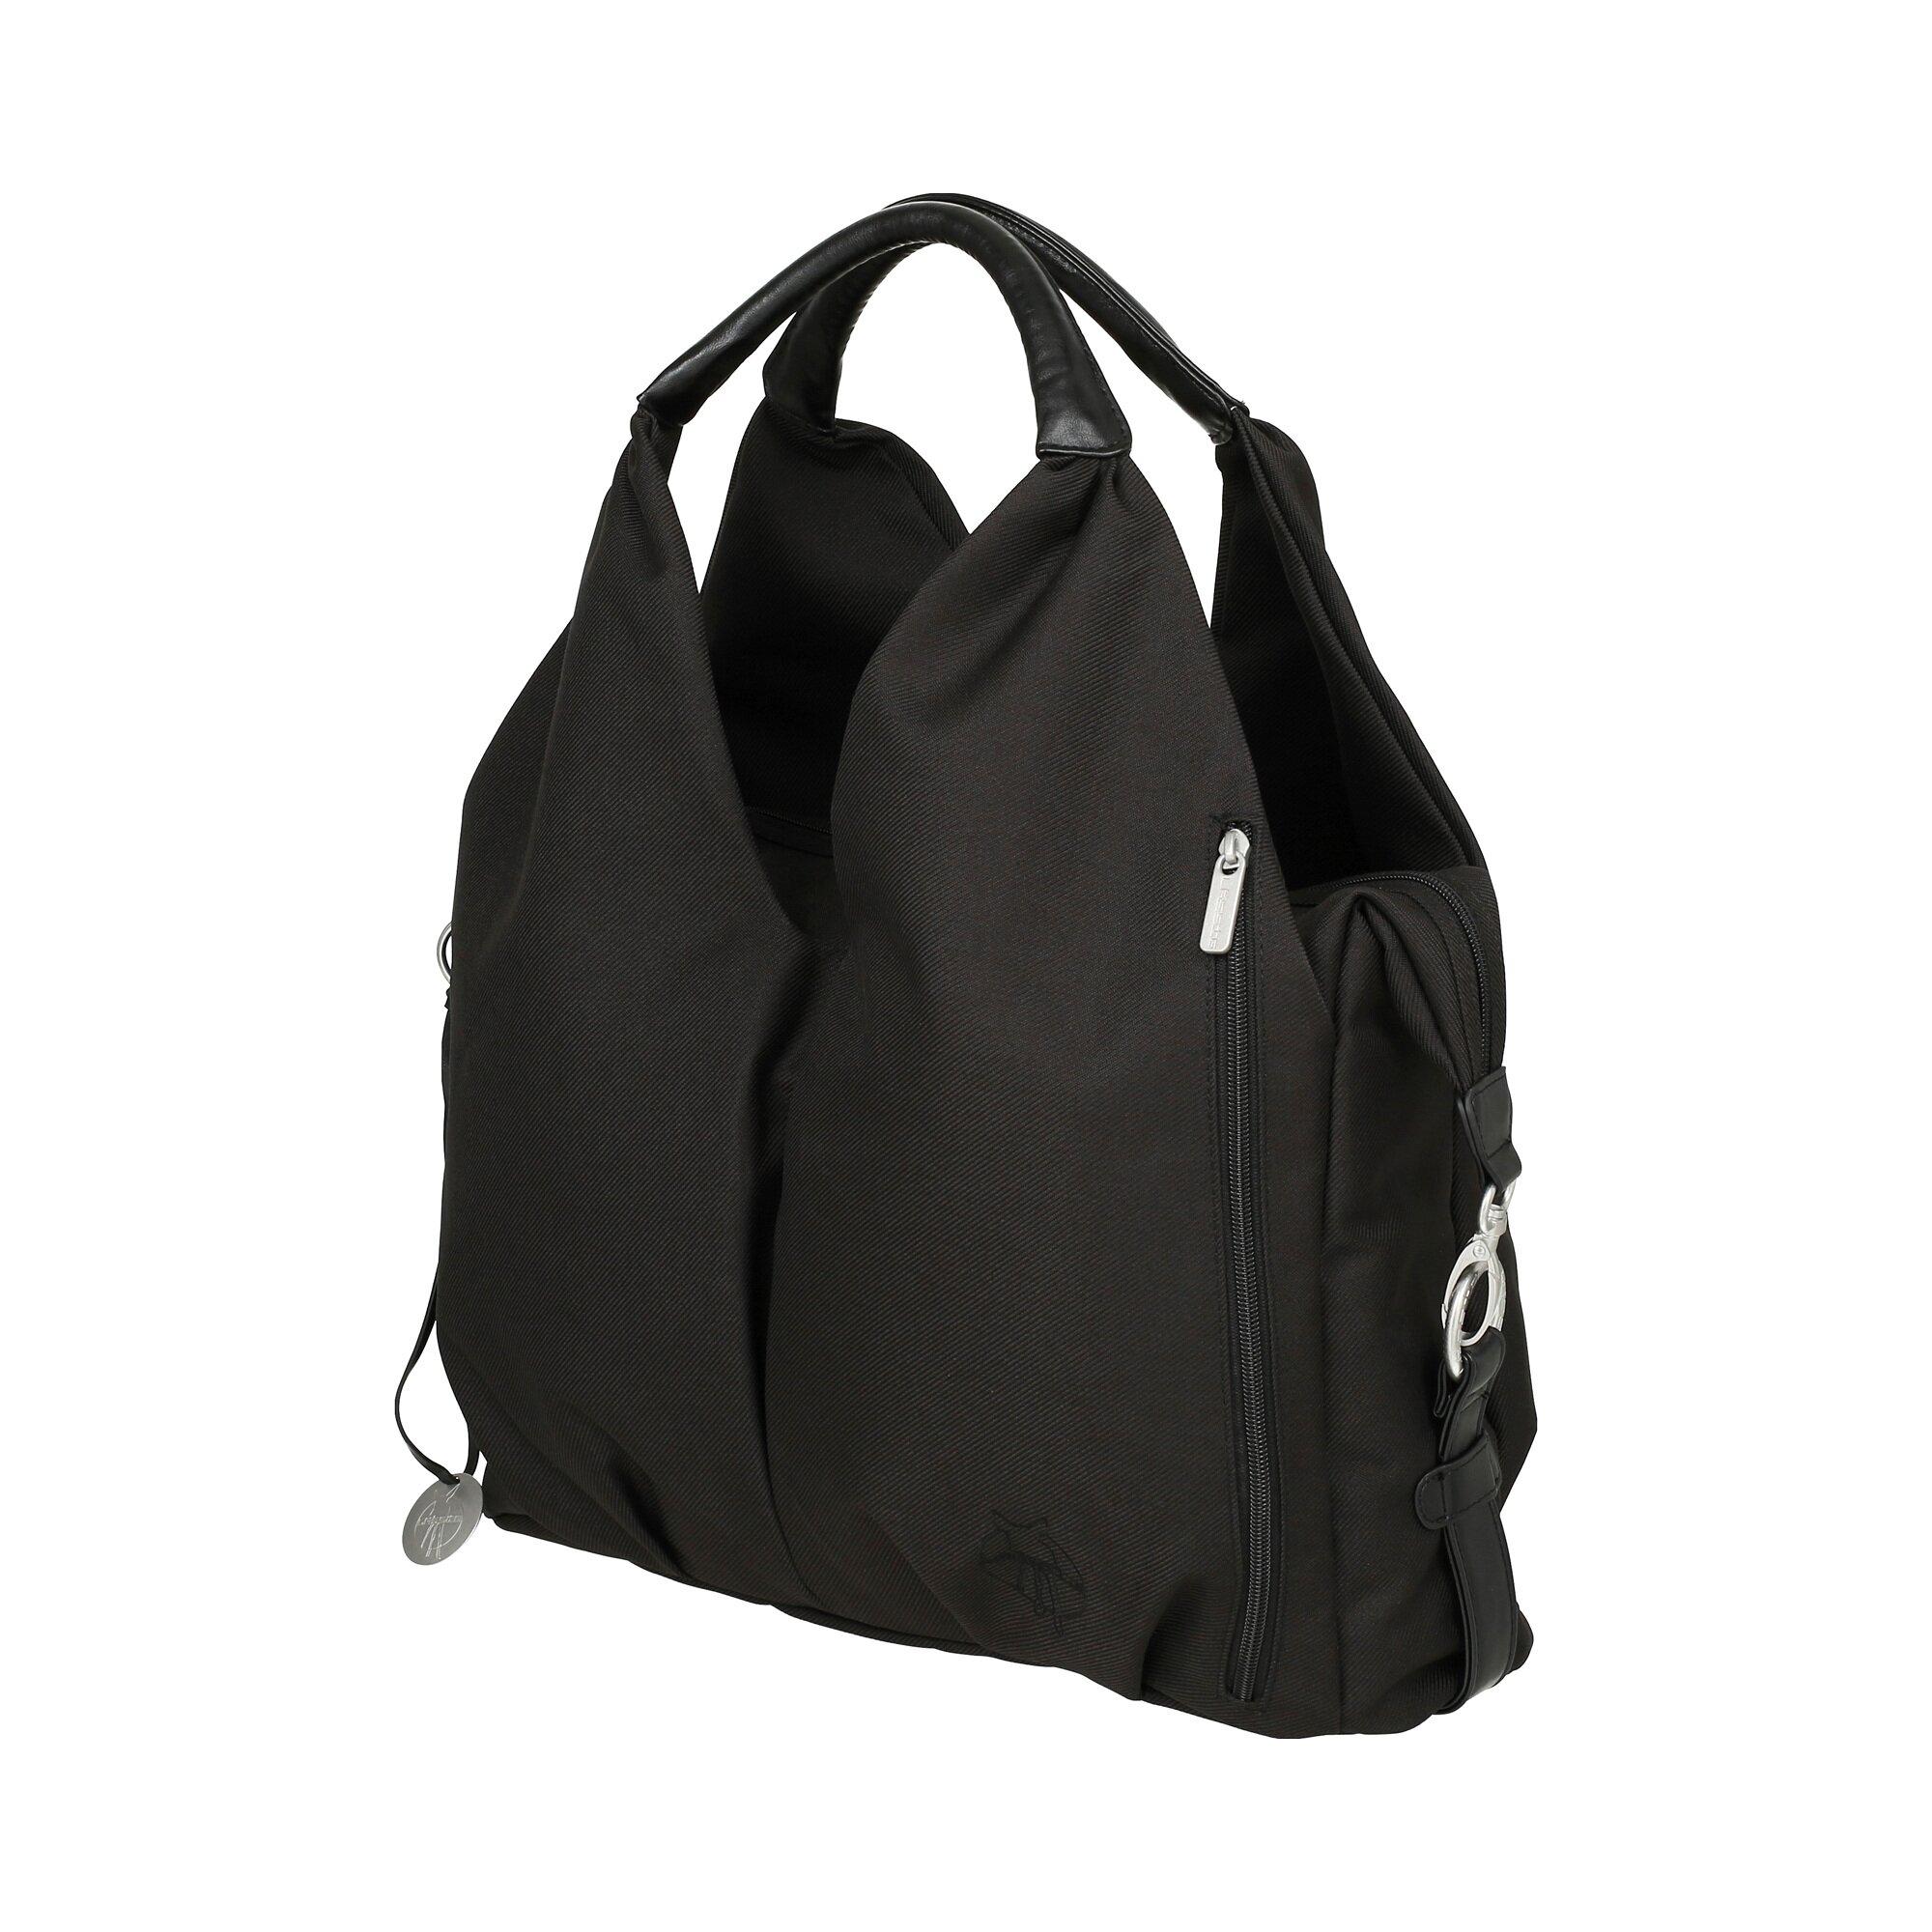 green-label-wickeltache-neckline-bag-black-